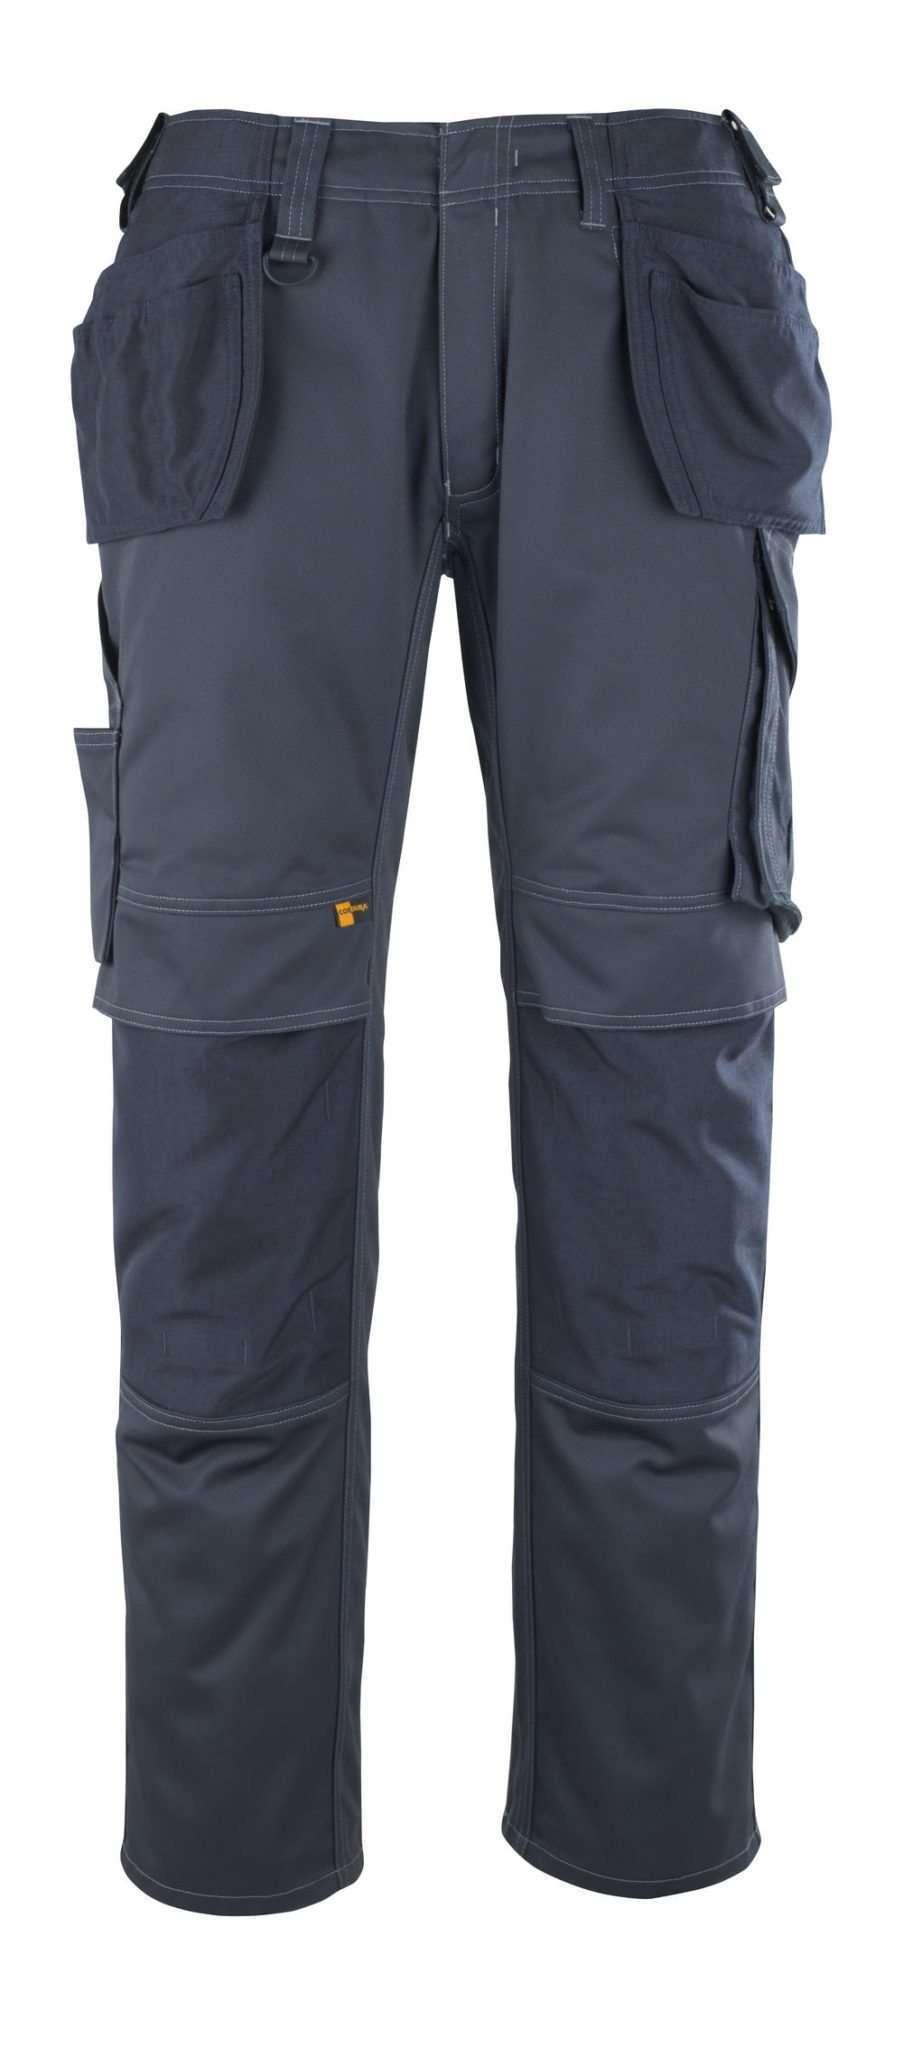 Mascot® Bremen Craftsmen's Trousers